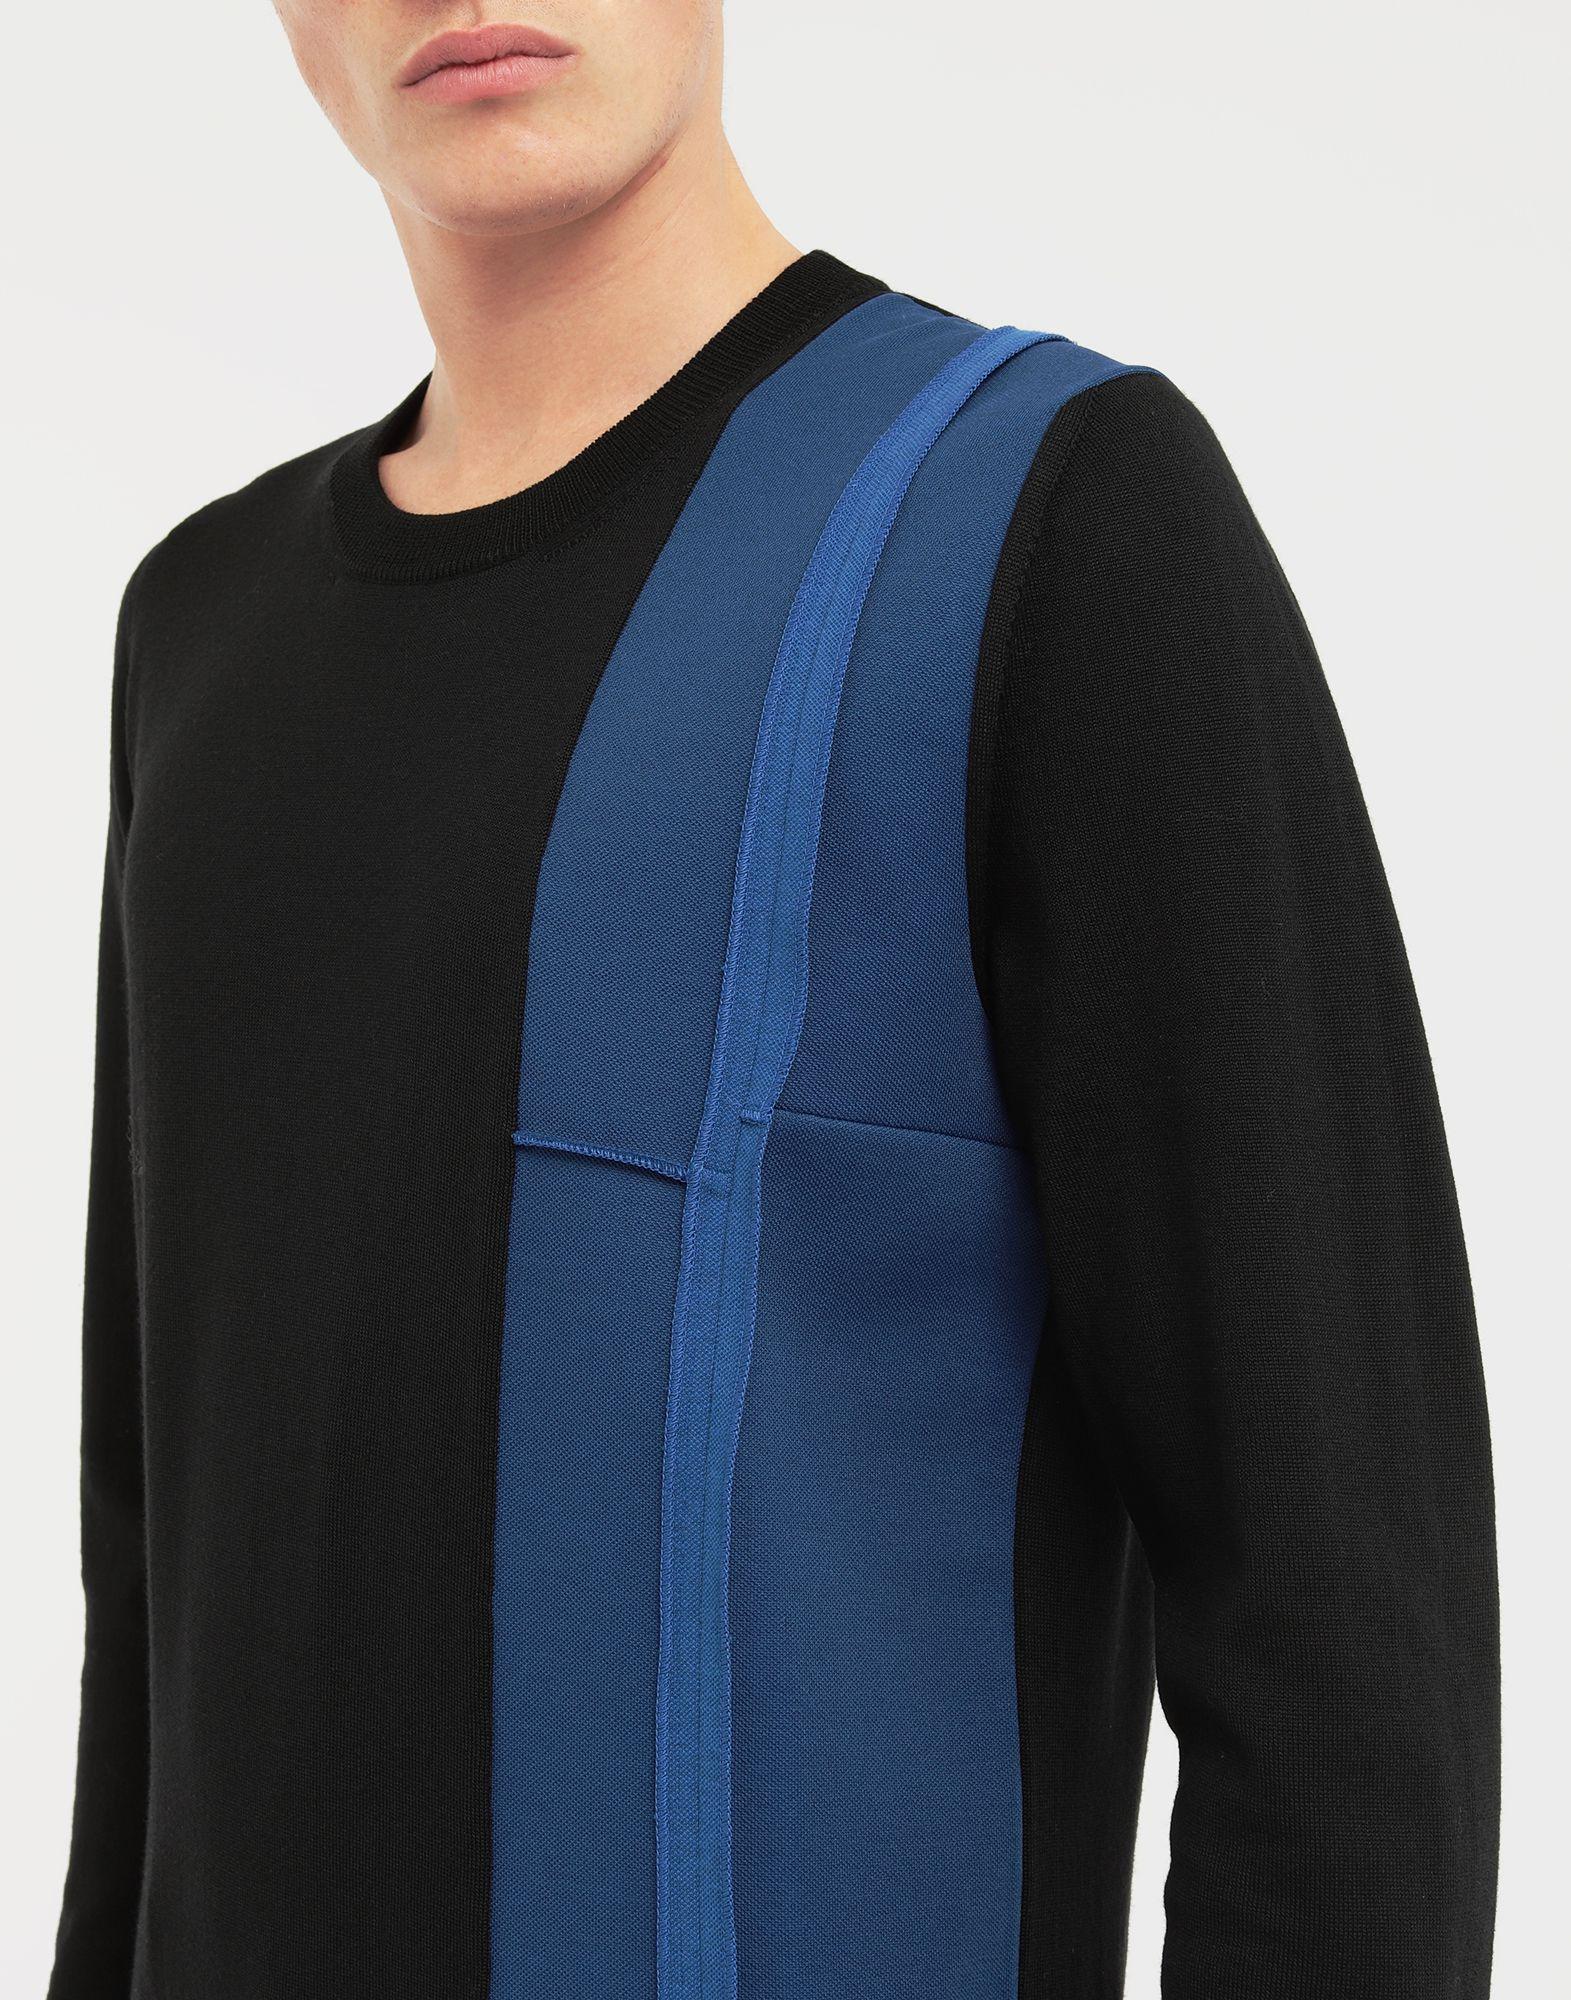 MAISON MARGIELA Spliced wool knit pullover Long sleeve sweater Man a